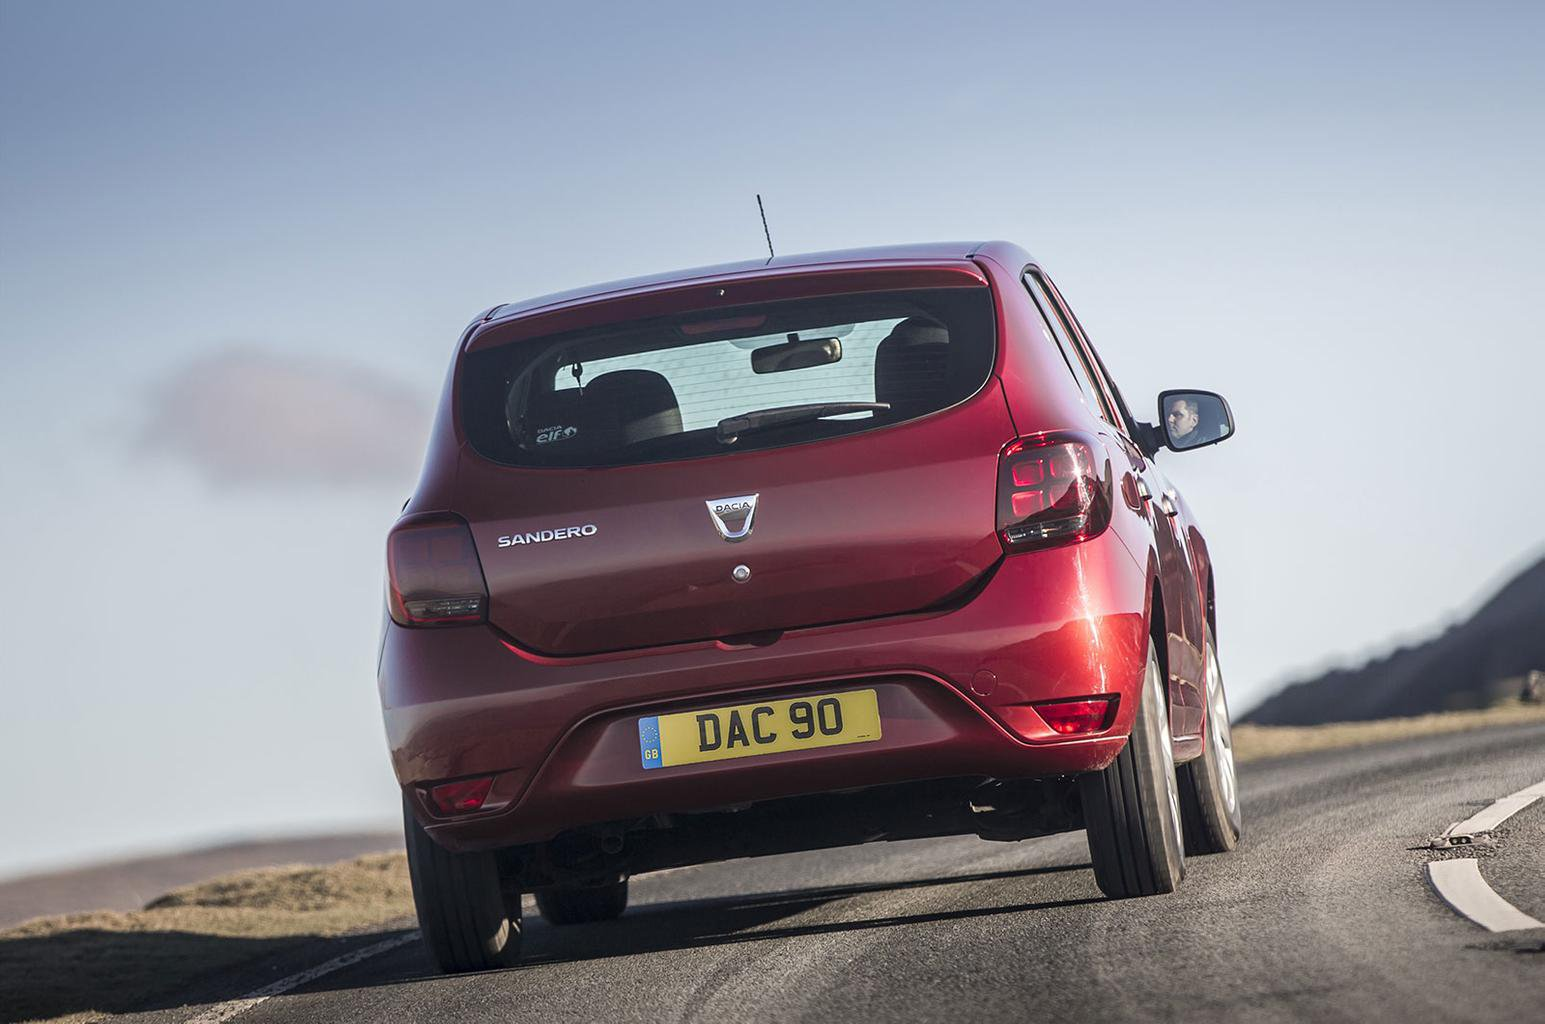 Dacia Sandero discounts: UK's cheapest new car just got cheaper